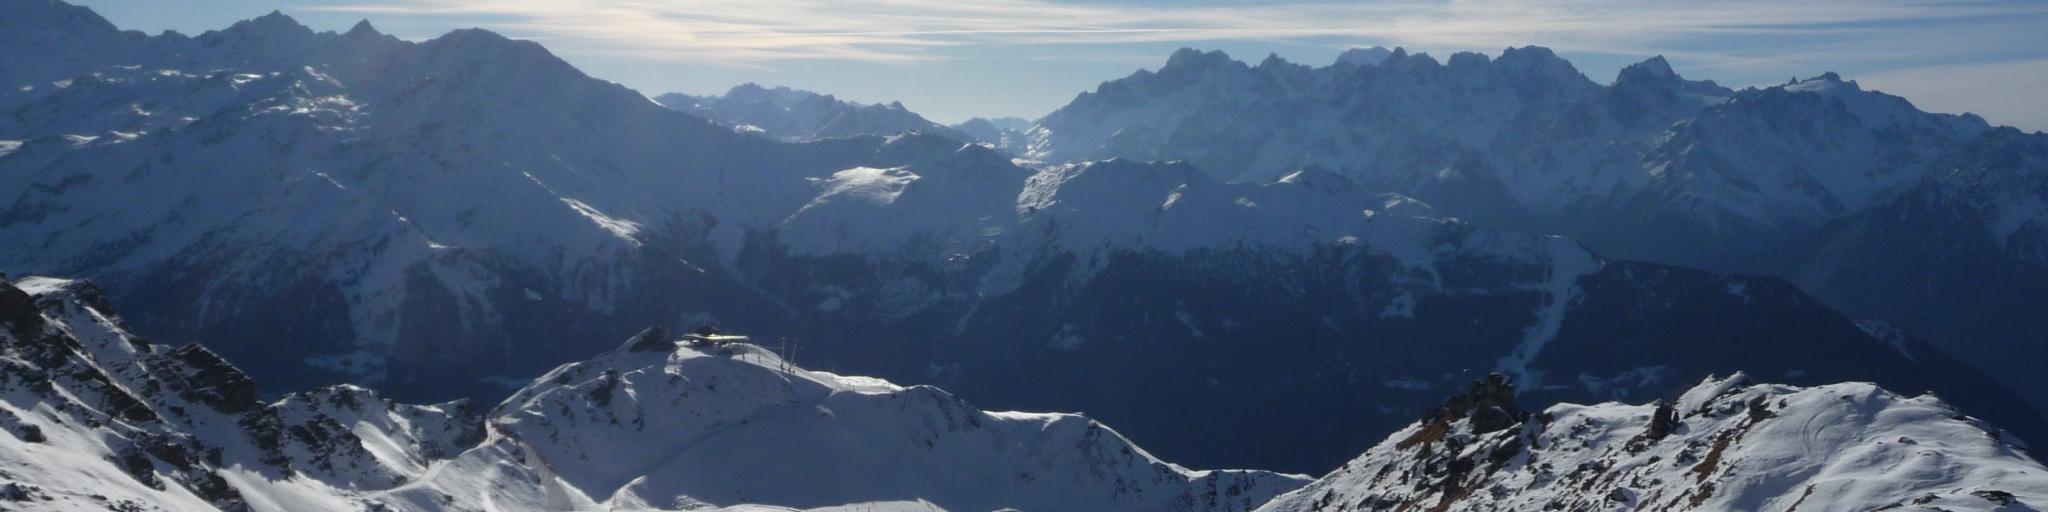 Skiers admiring the mountainous views in Verbier, Switzerland